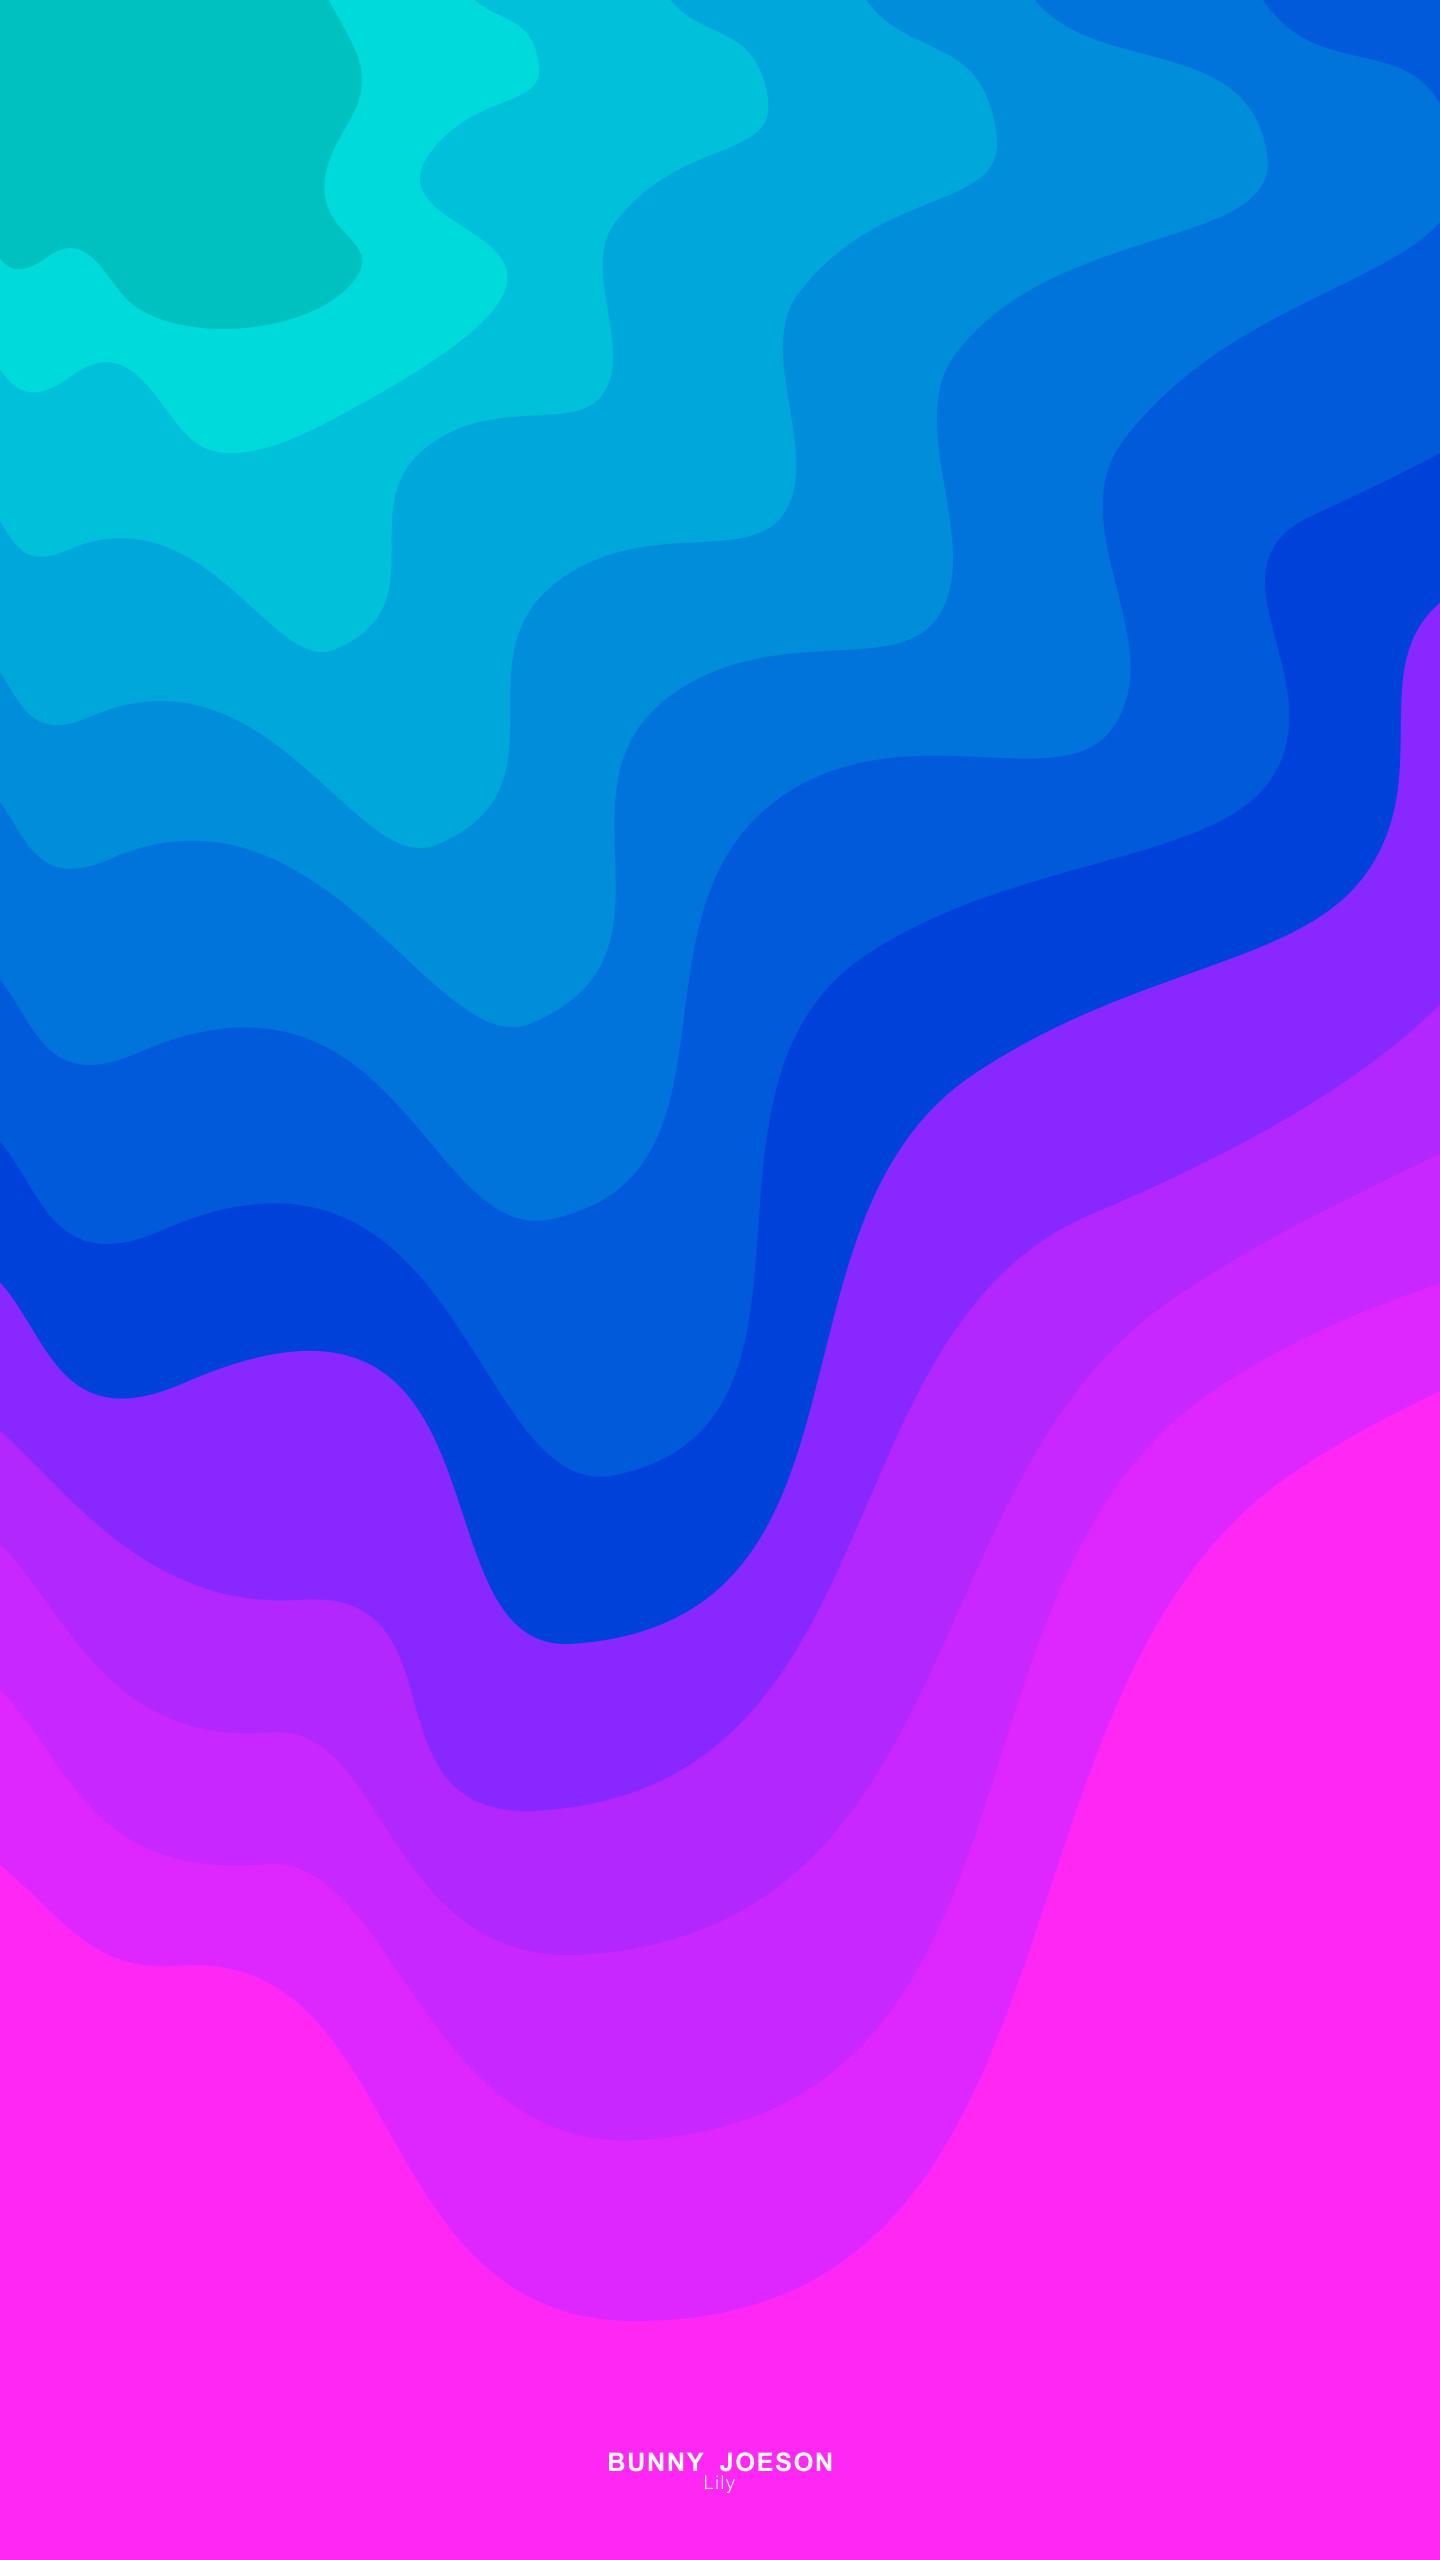 Iphone Phone Life Design Wallpaper Color Ios Android Sea Iphone Wallpaper Mkbhd Wallpapers Cellphone Wallpaper